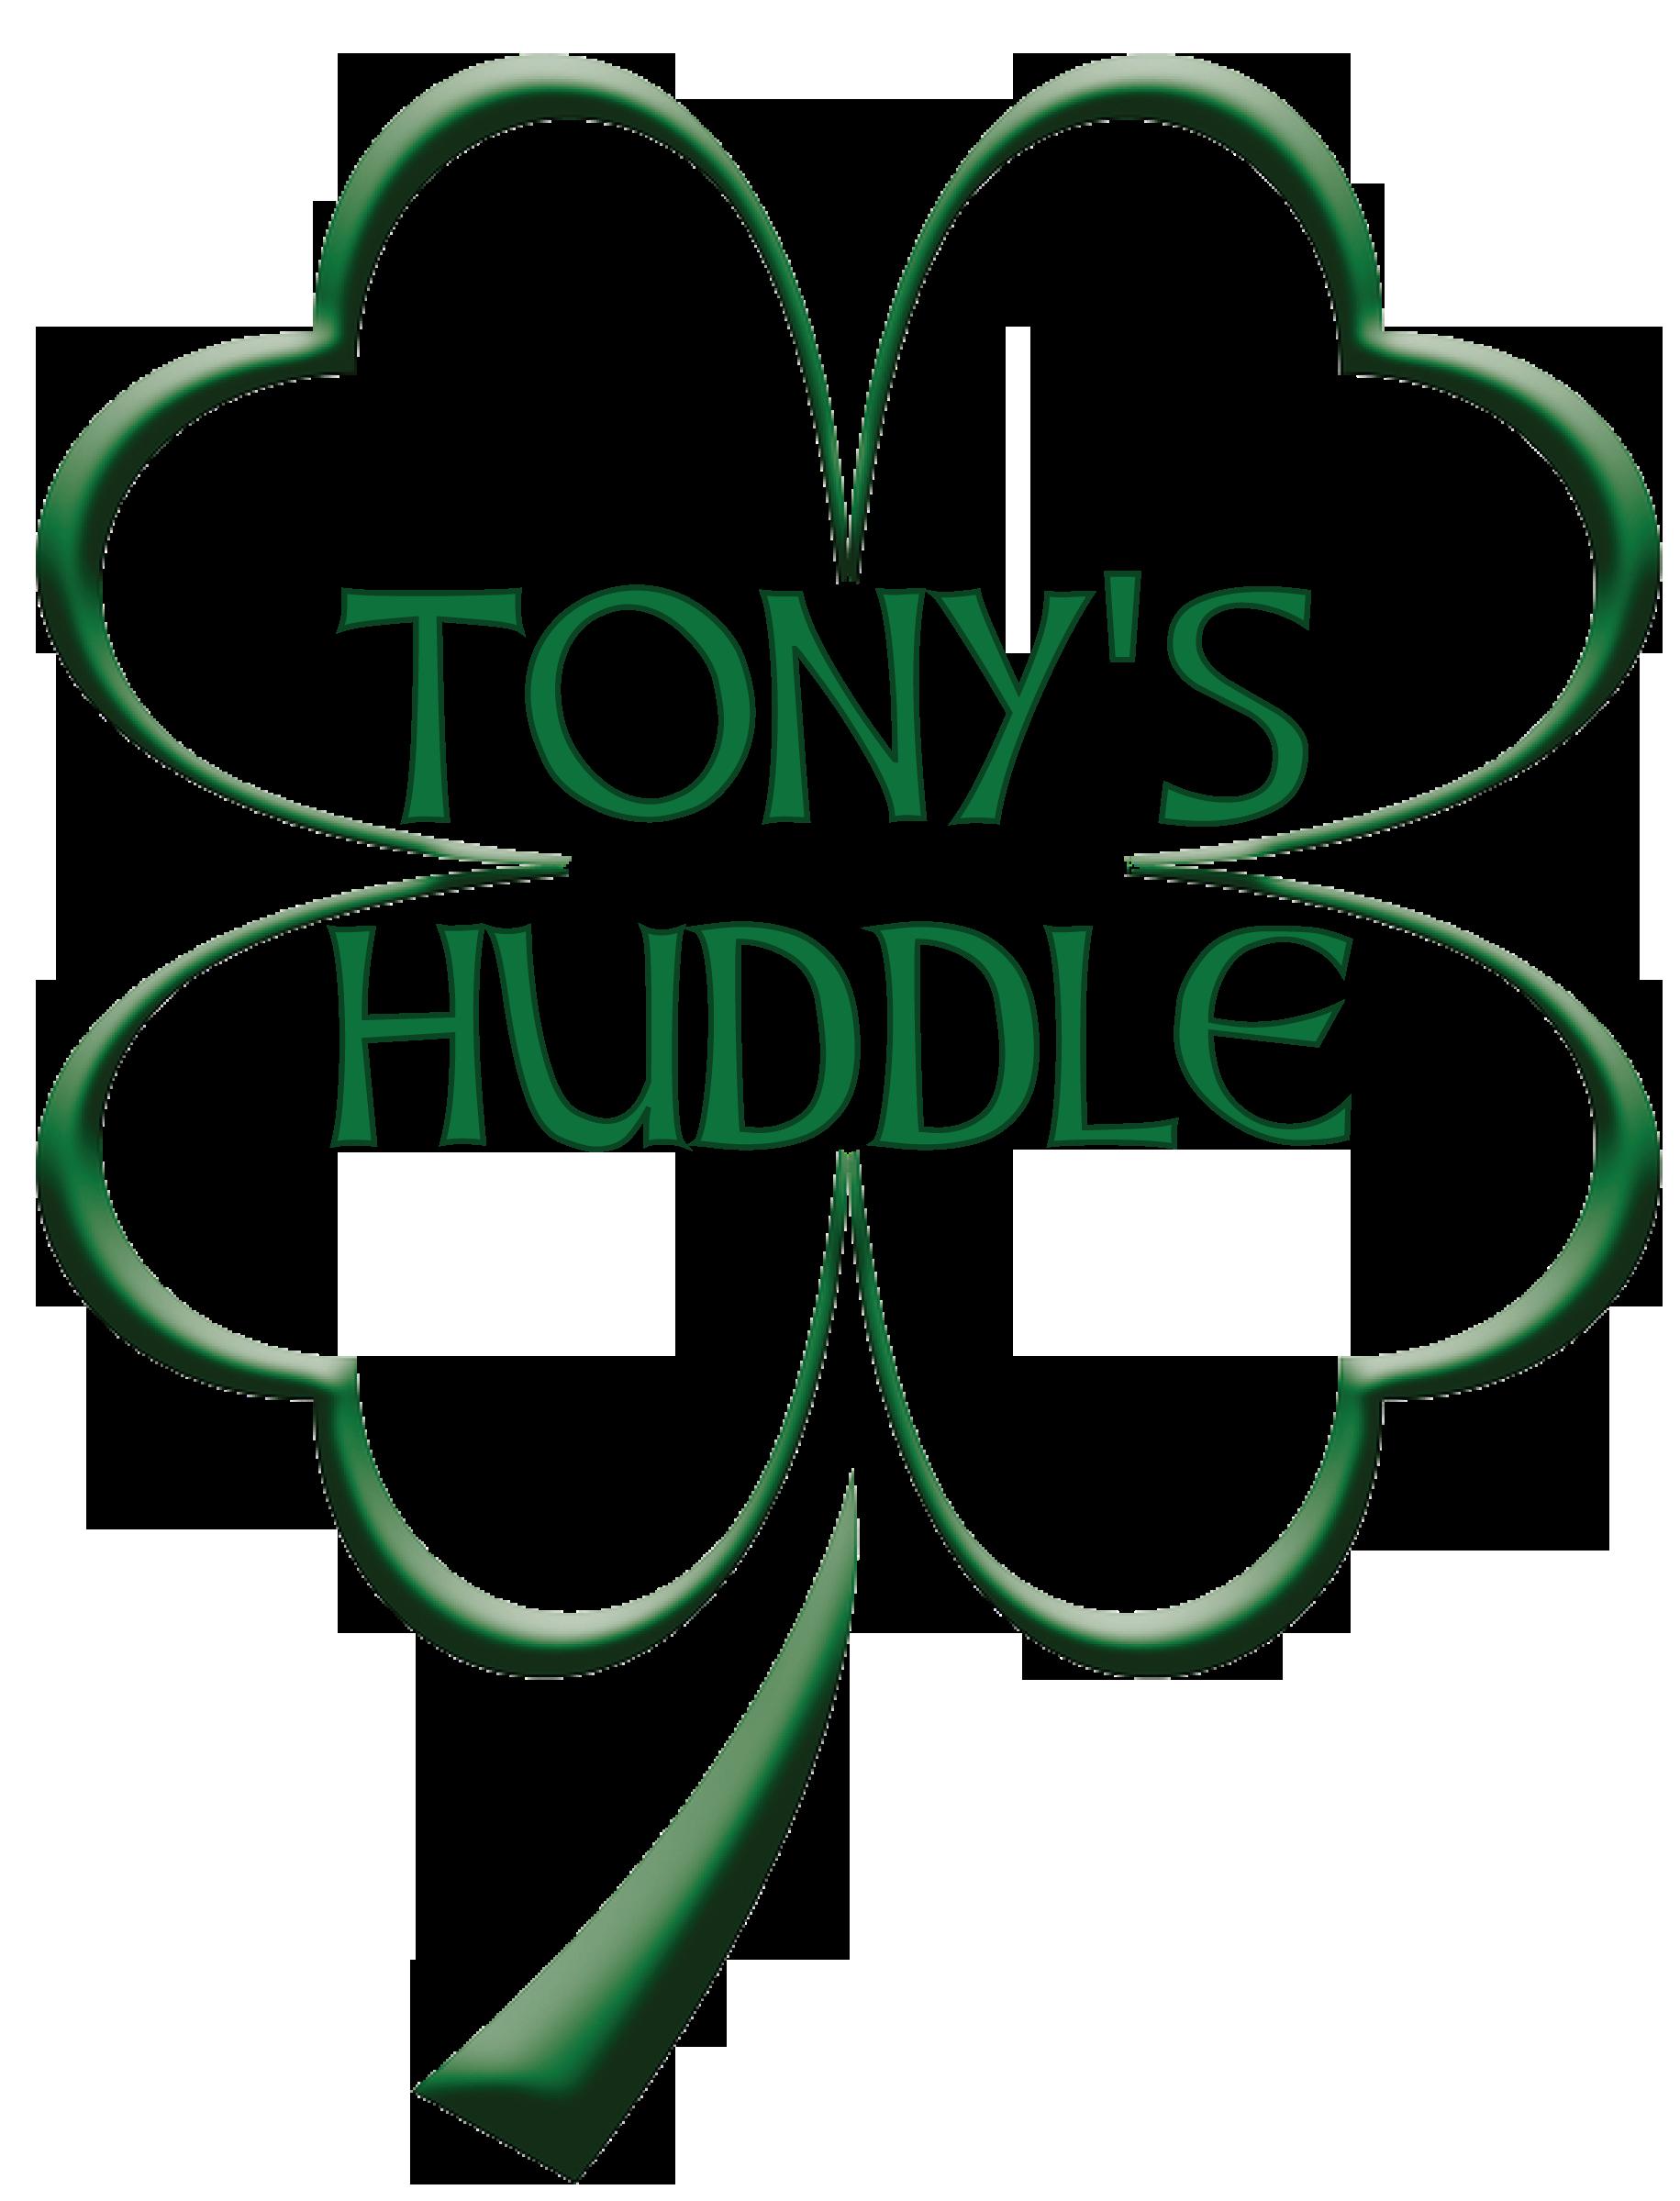 Celtic club tony s. Football huddle clipart